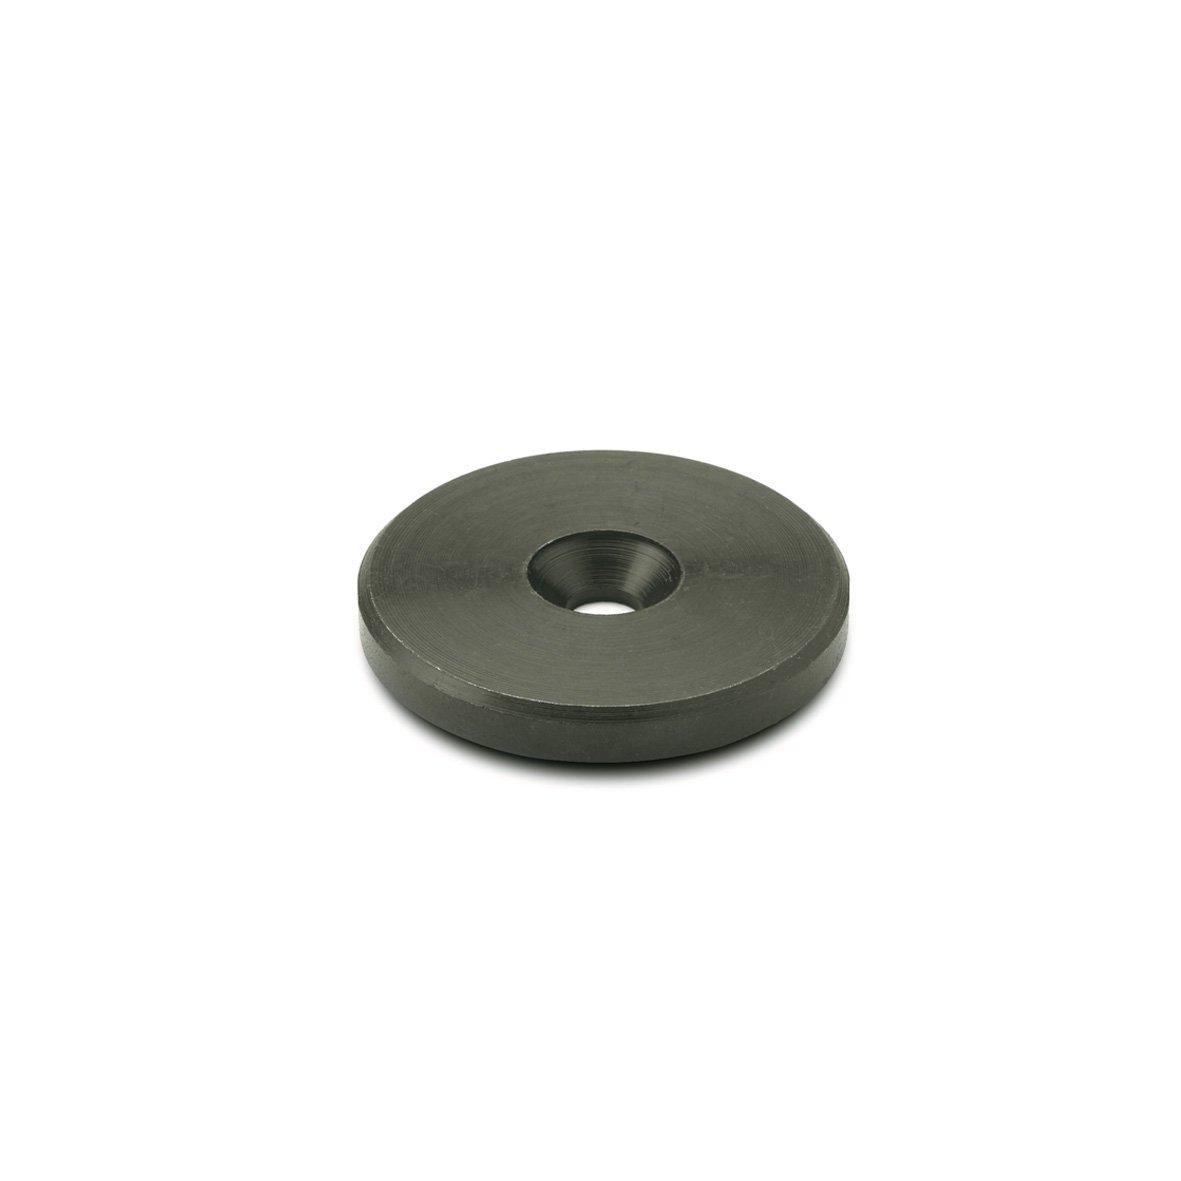 GN184 45 mm OD x 60.4 mm ID Steel Black Oxide Finish J.W Winco 45WG43 Countersunk Washer